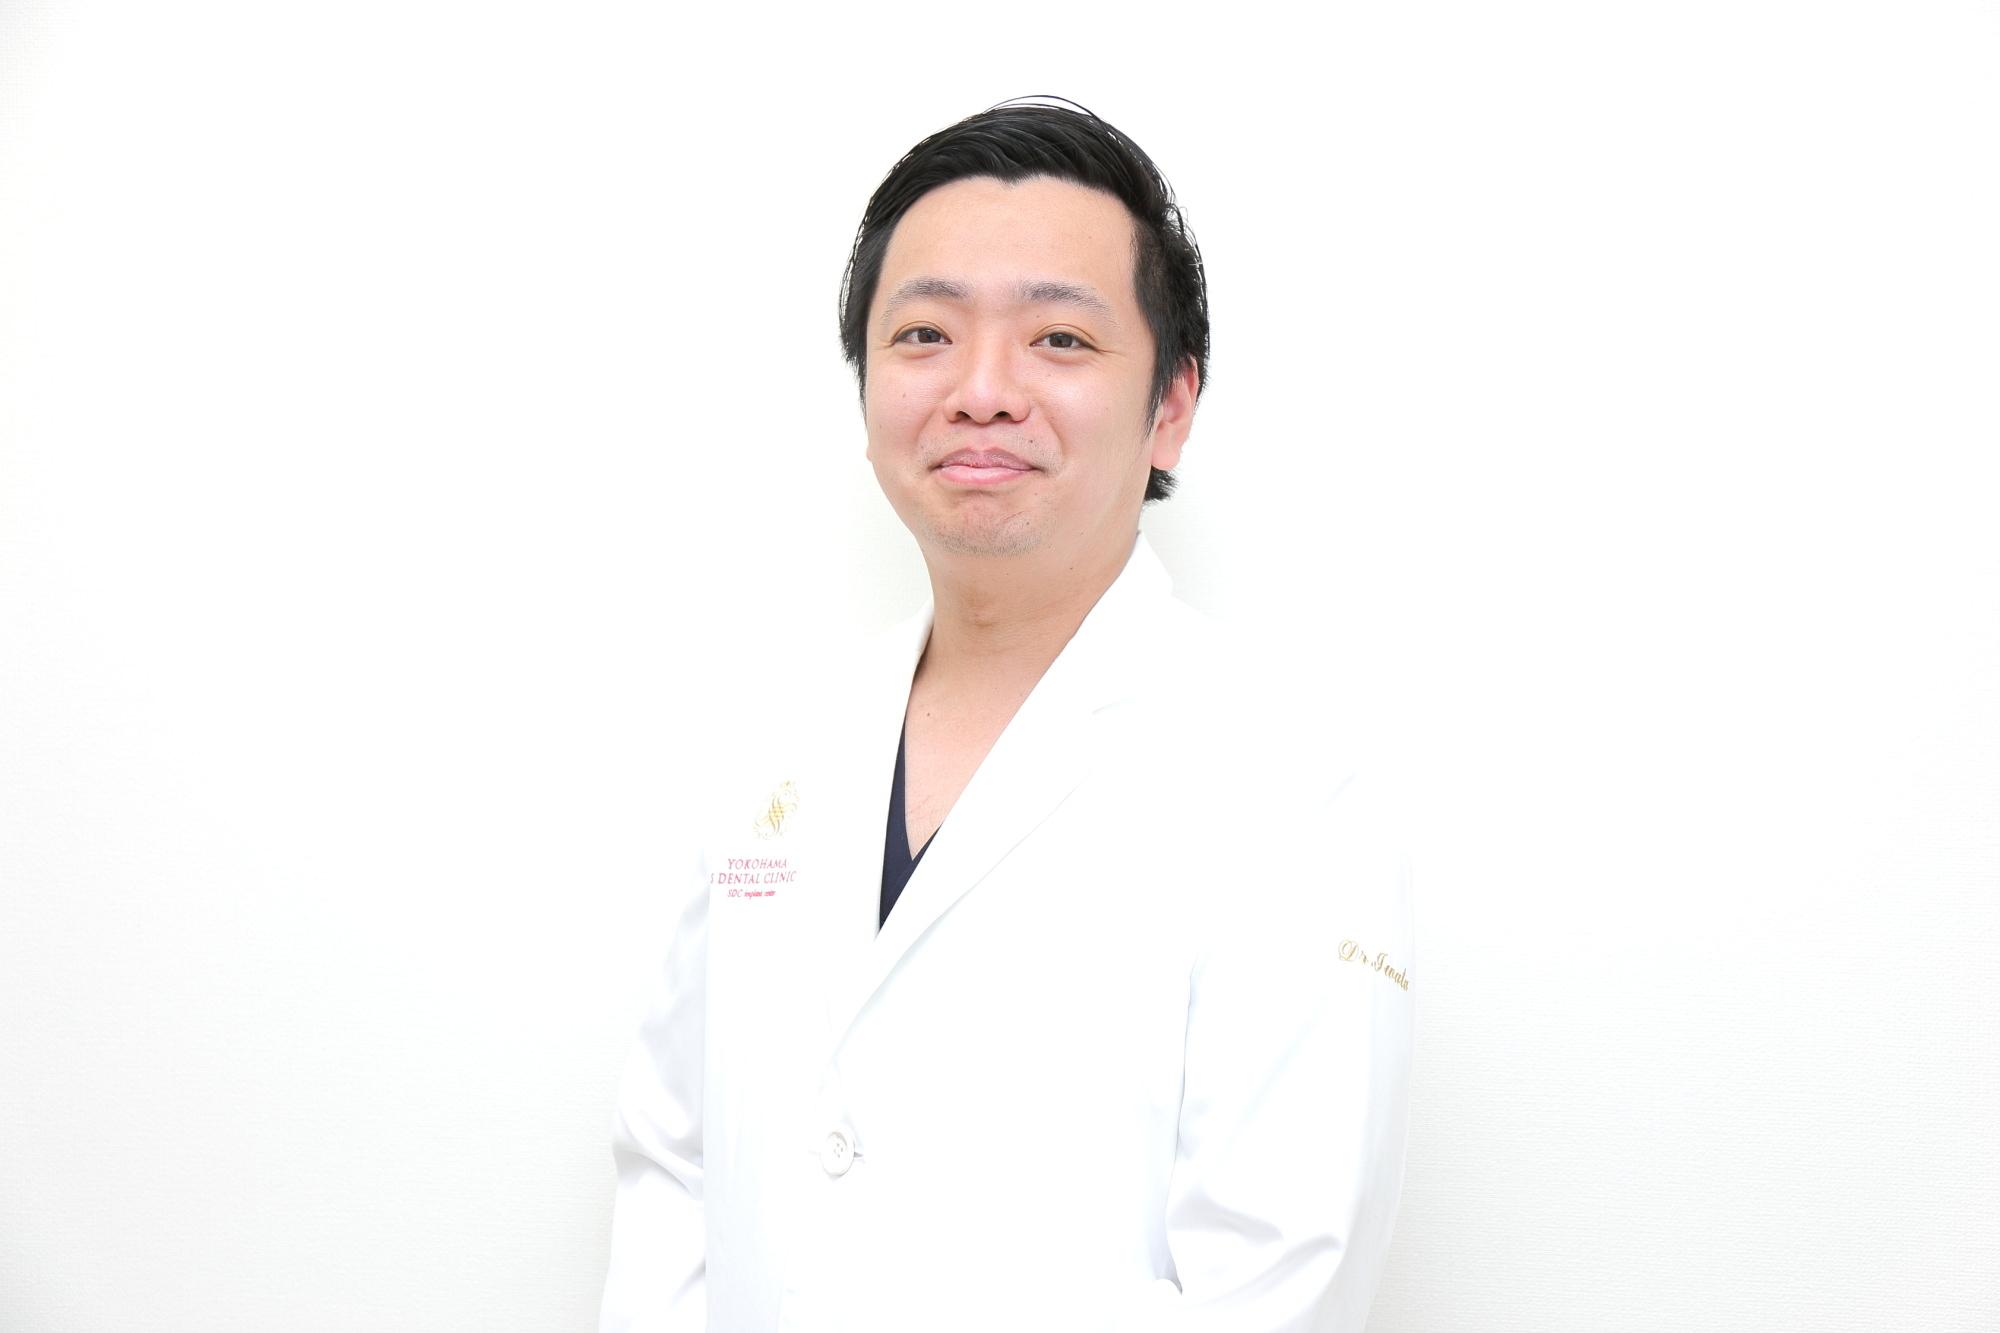 岩田翔太 ShotaIwata